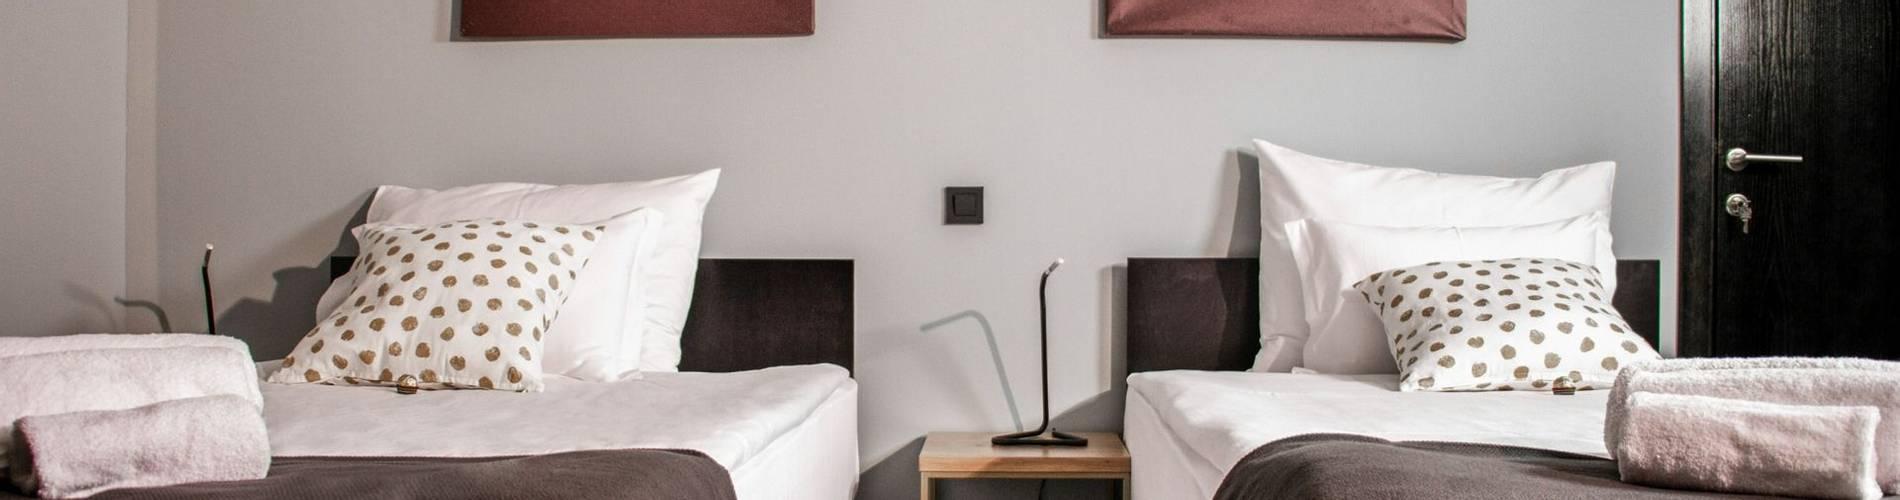 Hotel_Lyra_Plitvice_Room_7.jpg